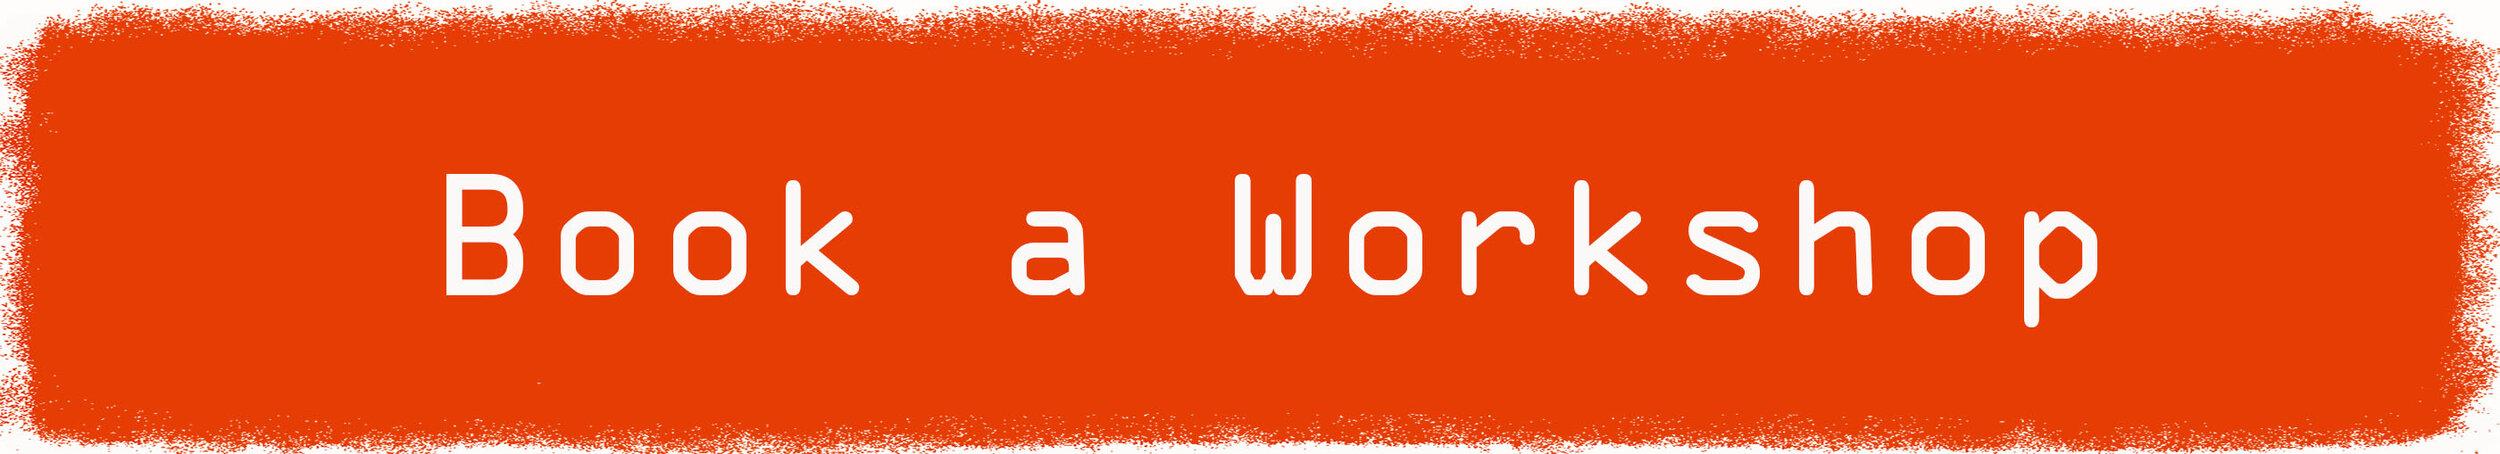 button_book_a_workshop.jpg